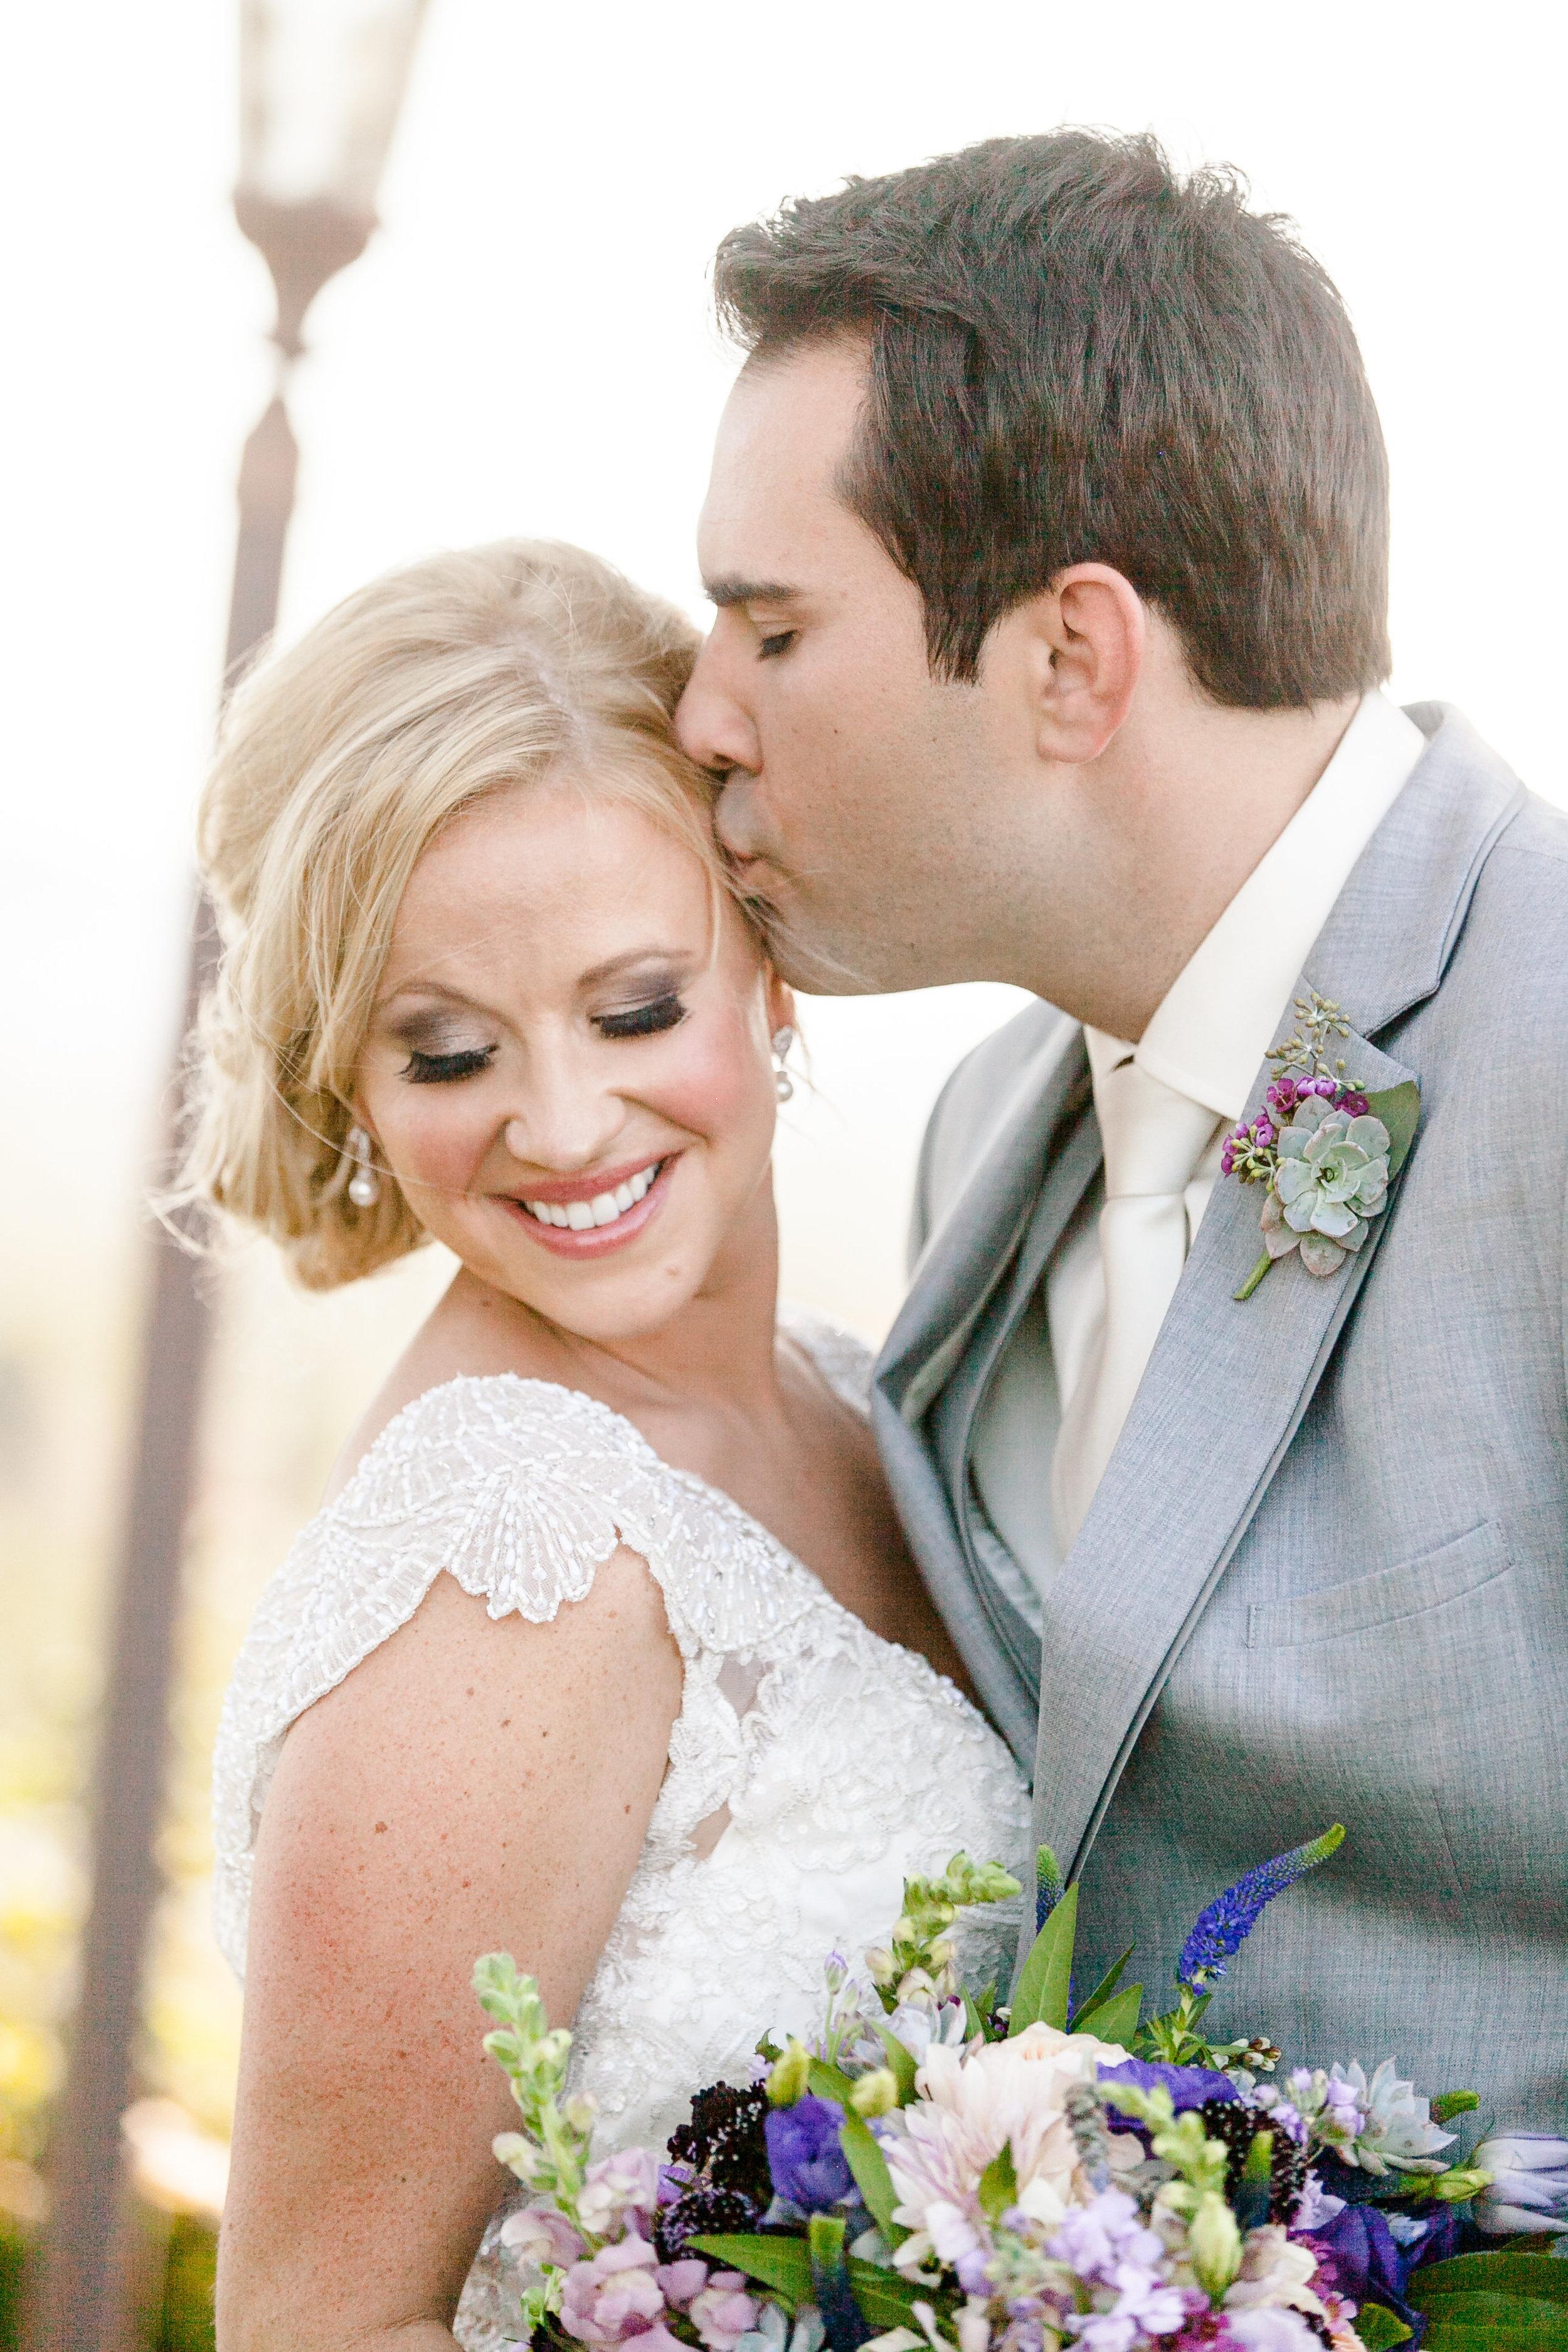 Temecula Wedding Hair and Makeup | Temecula Winery Wedding | Callaway Winery Wedding